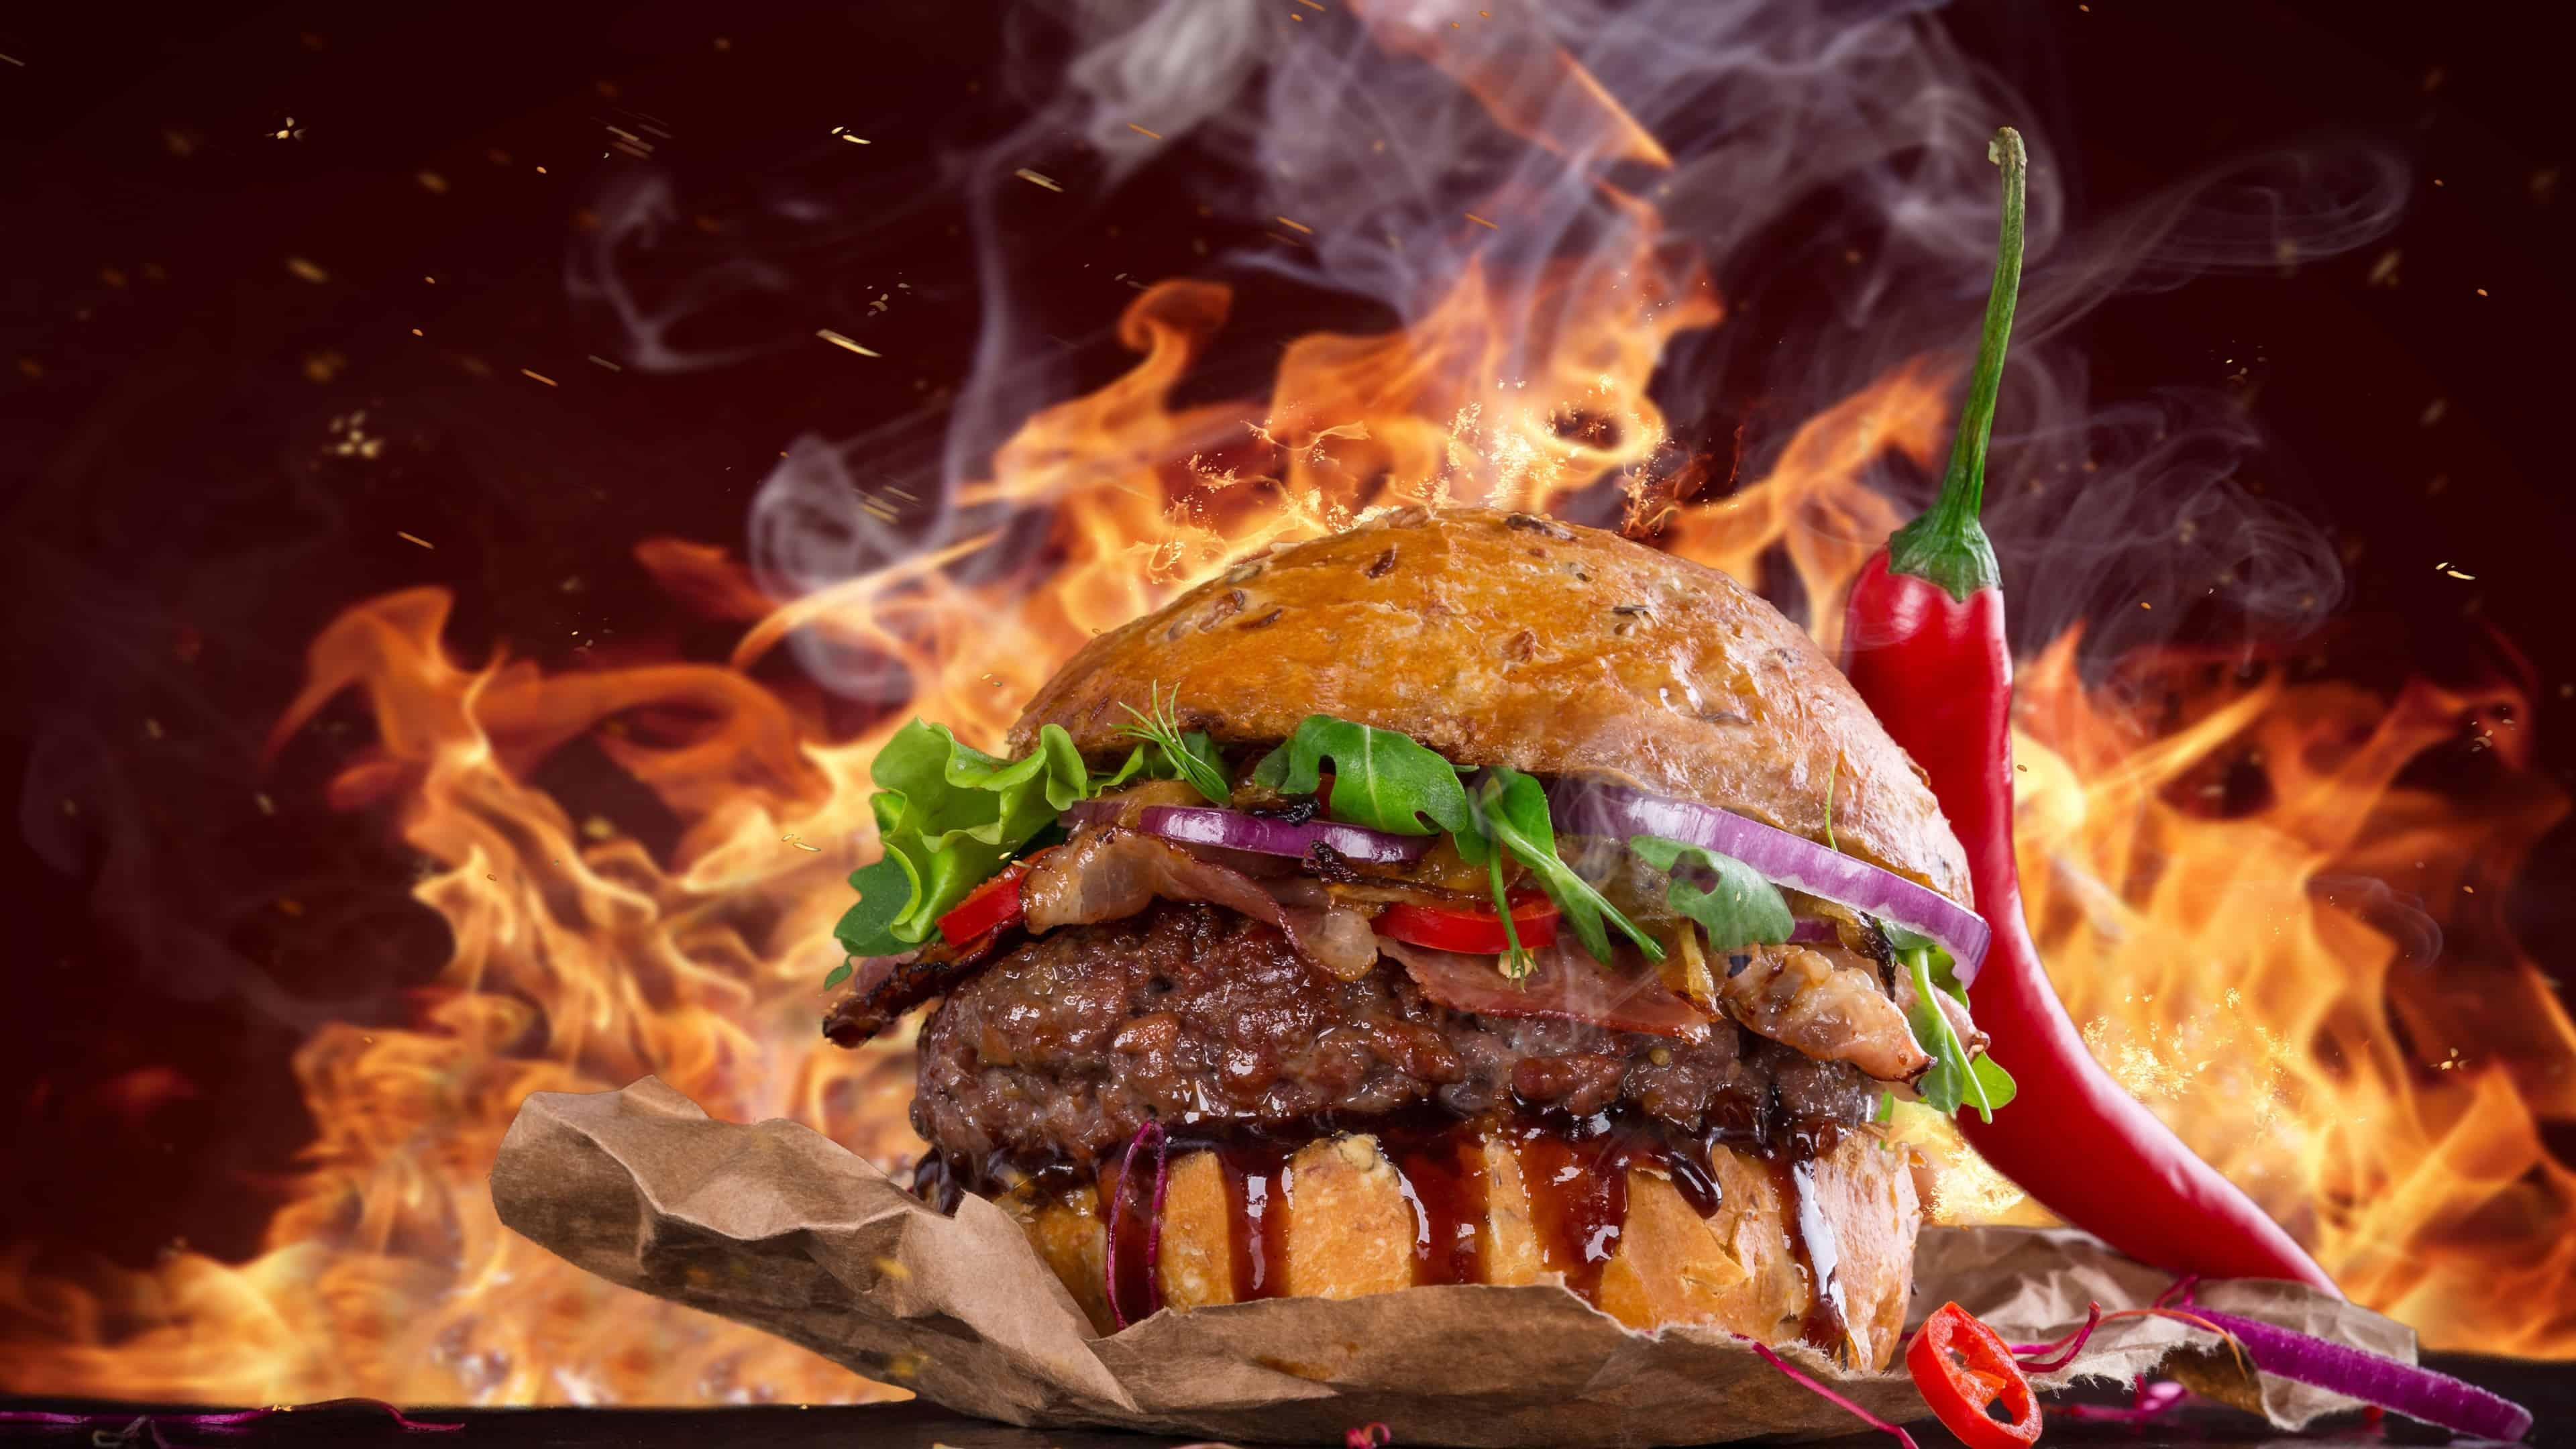 hamburger spicy uhd 4k wallpaper